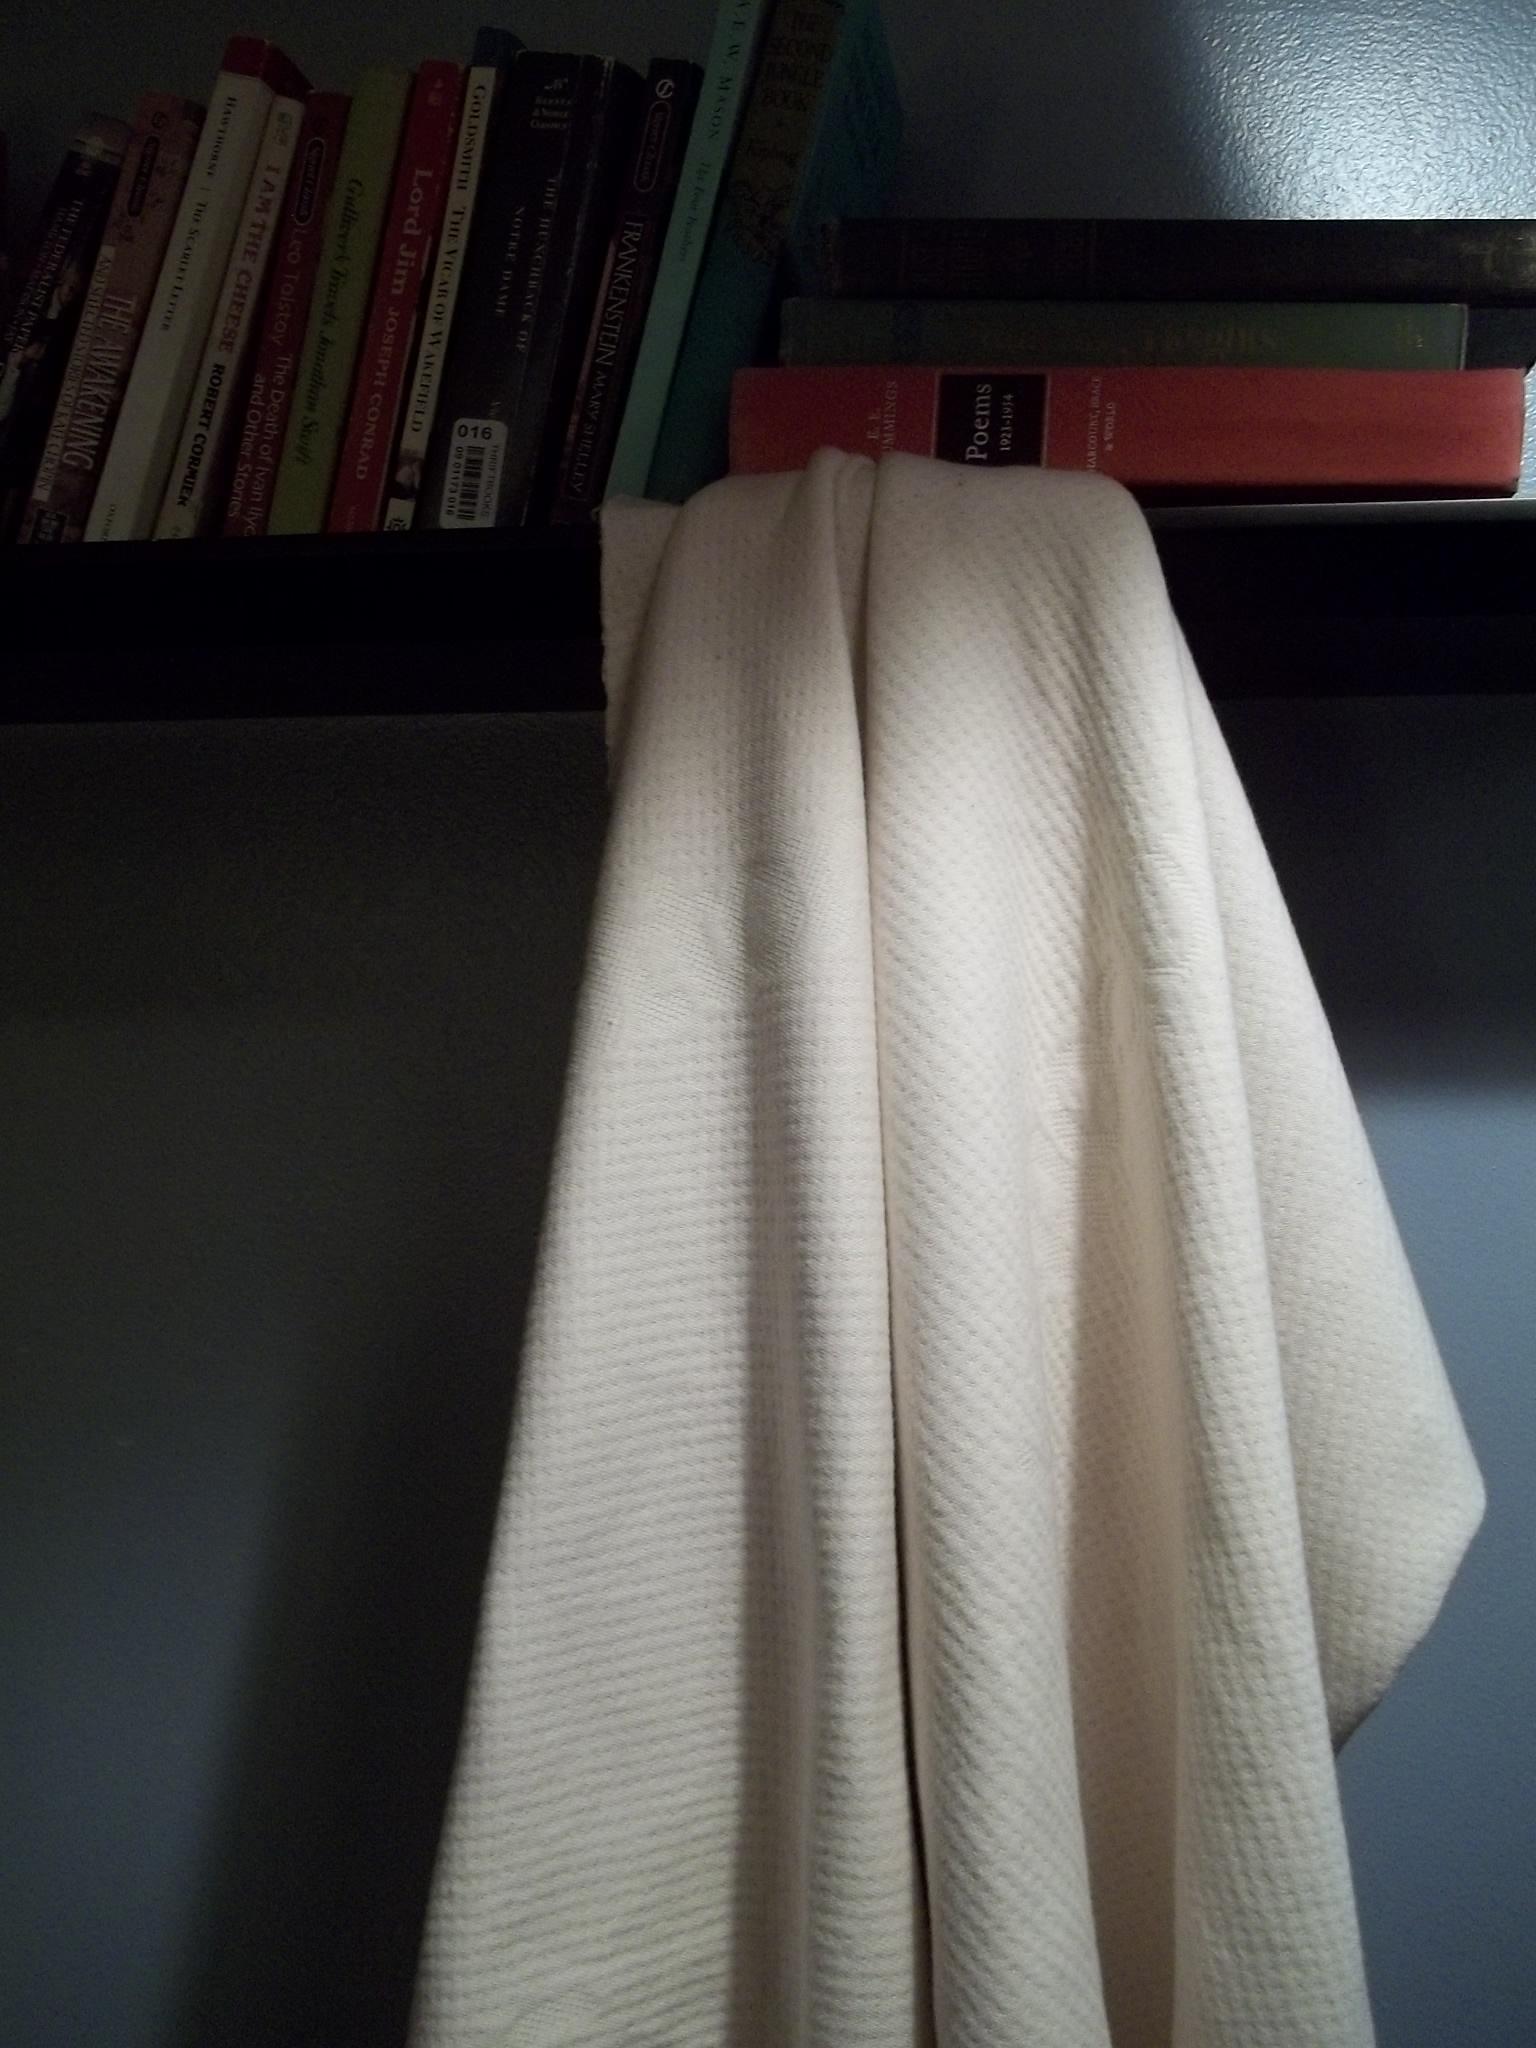 6340b918737 Double Knit GOTS Organic Cotton Fabric Hanging Books